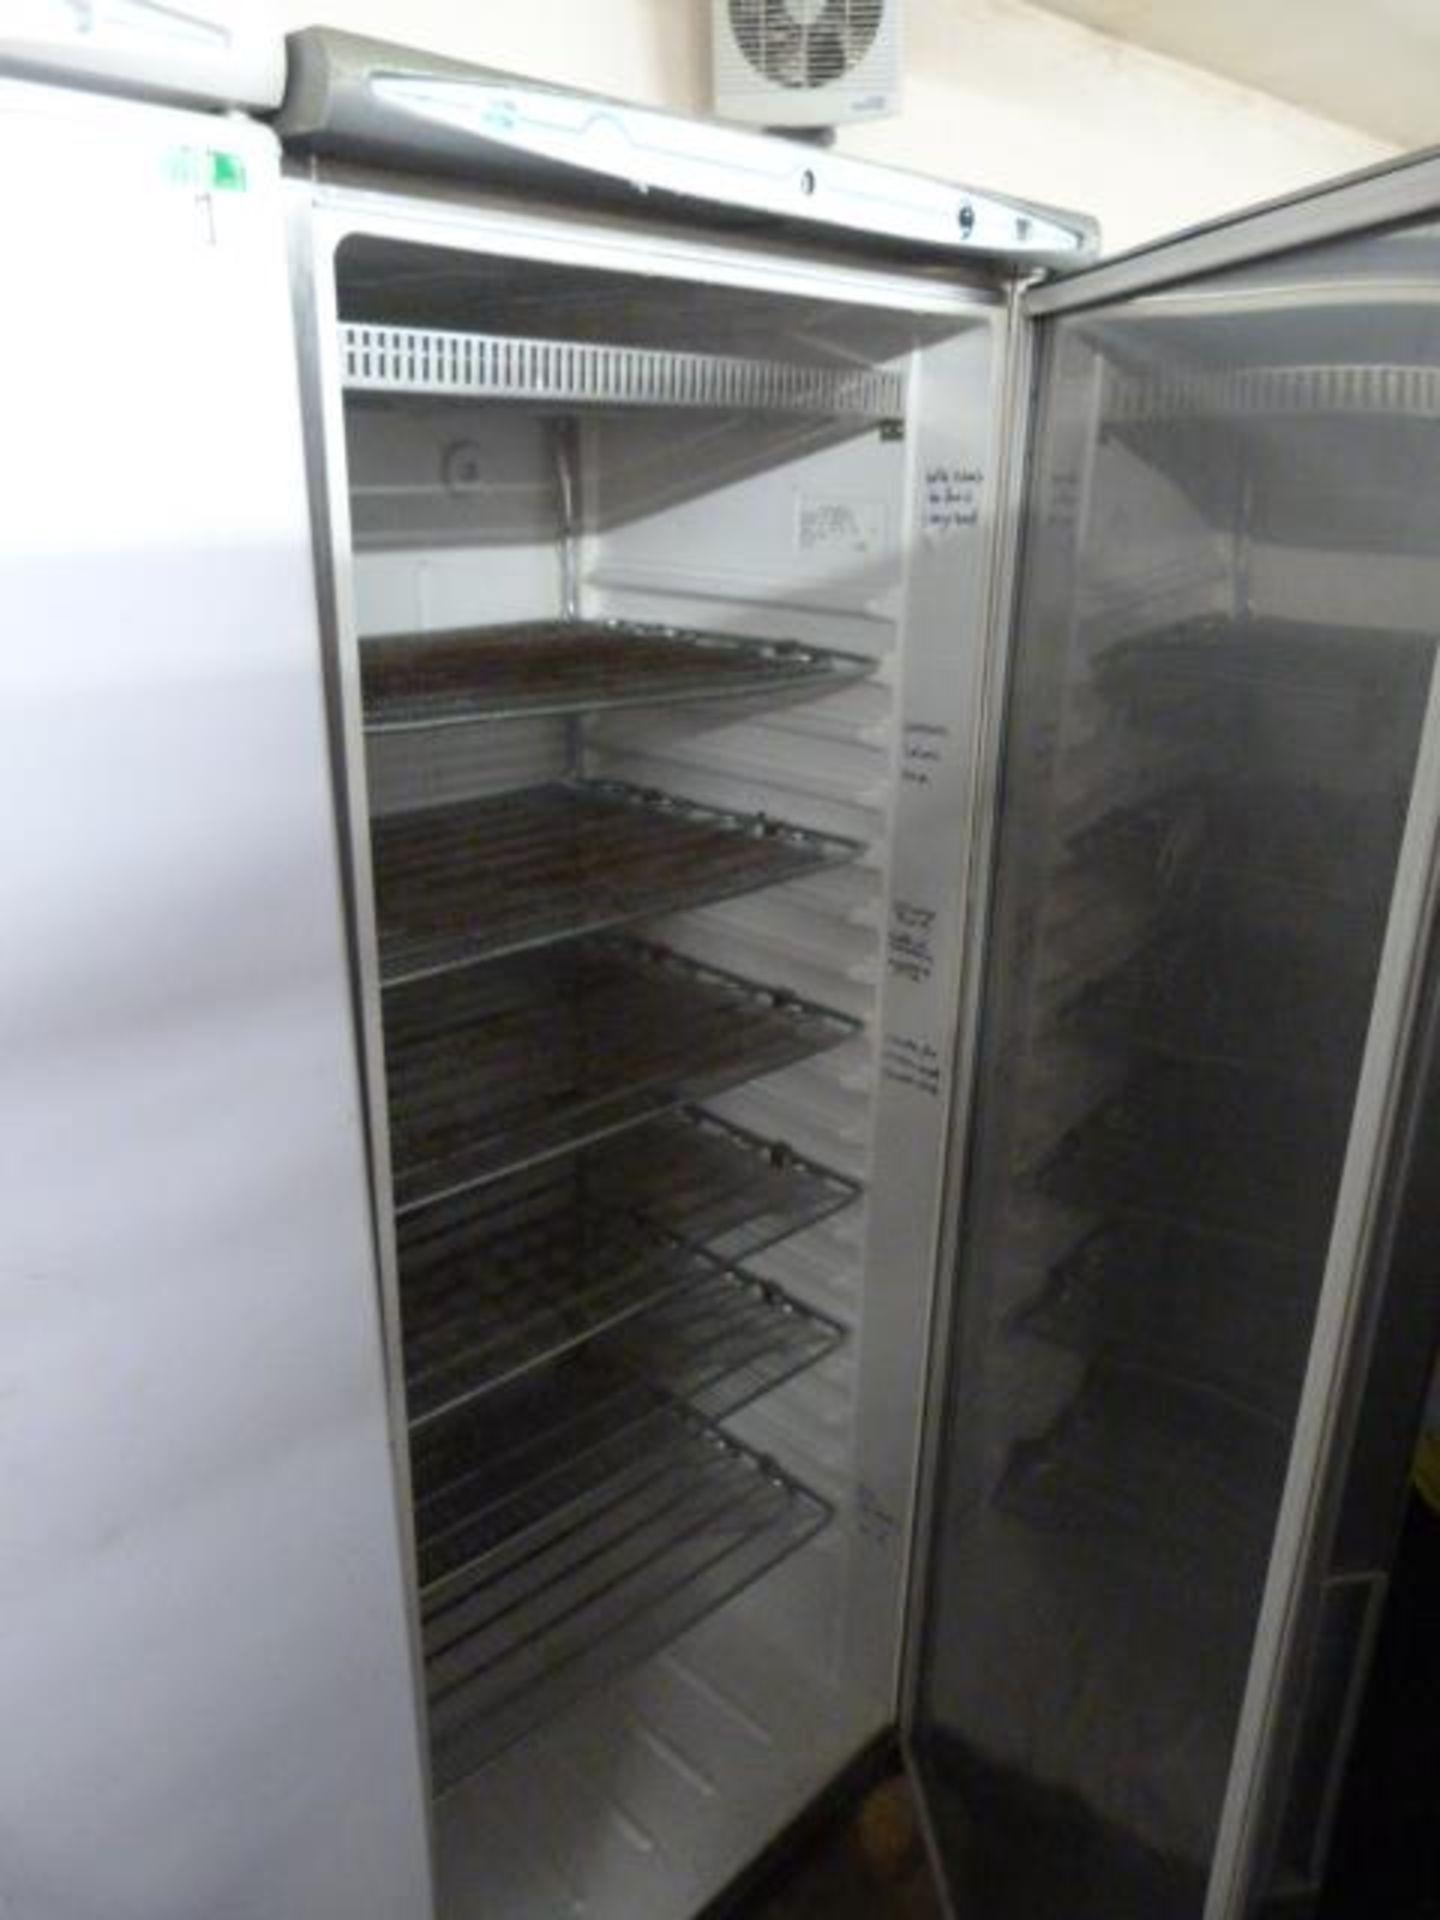 Lot 16 - Mondial Stainless Steel Refrigerator